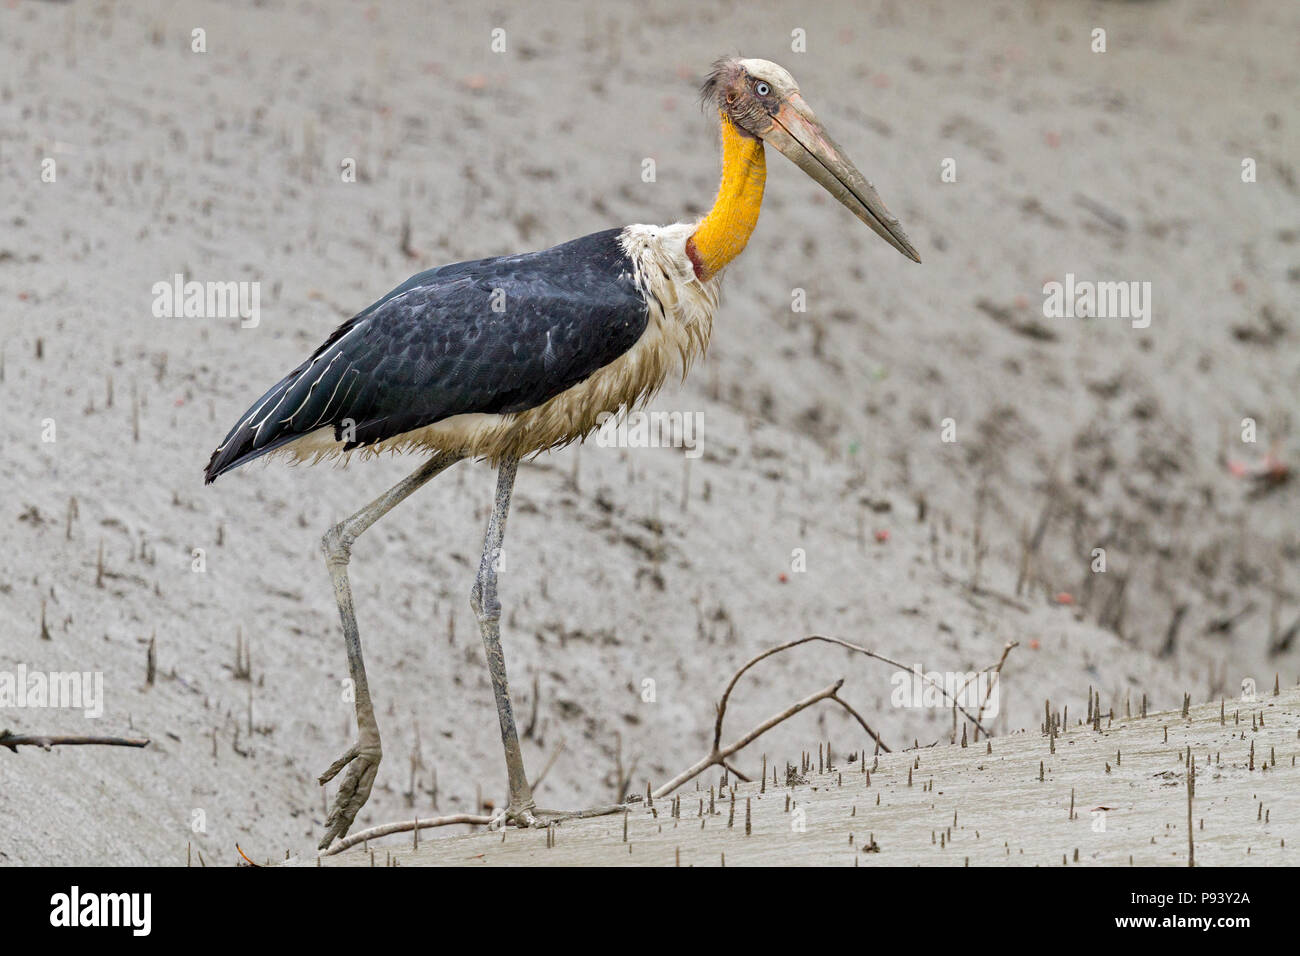 Lesser adjutant or Leptoptilos javanicus threatened species in Sunderbans national park India - Stock Image